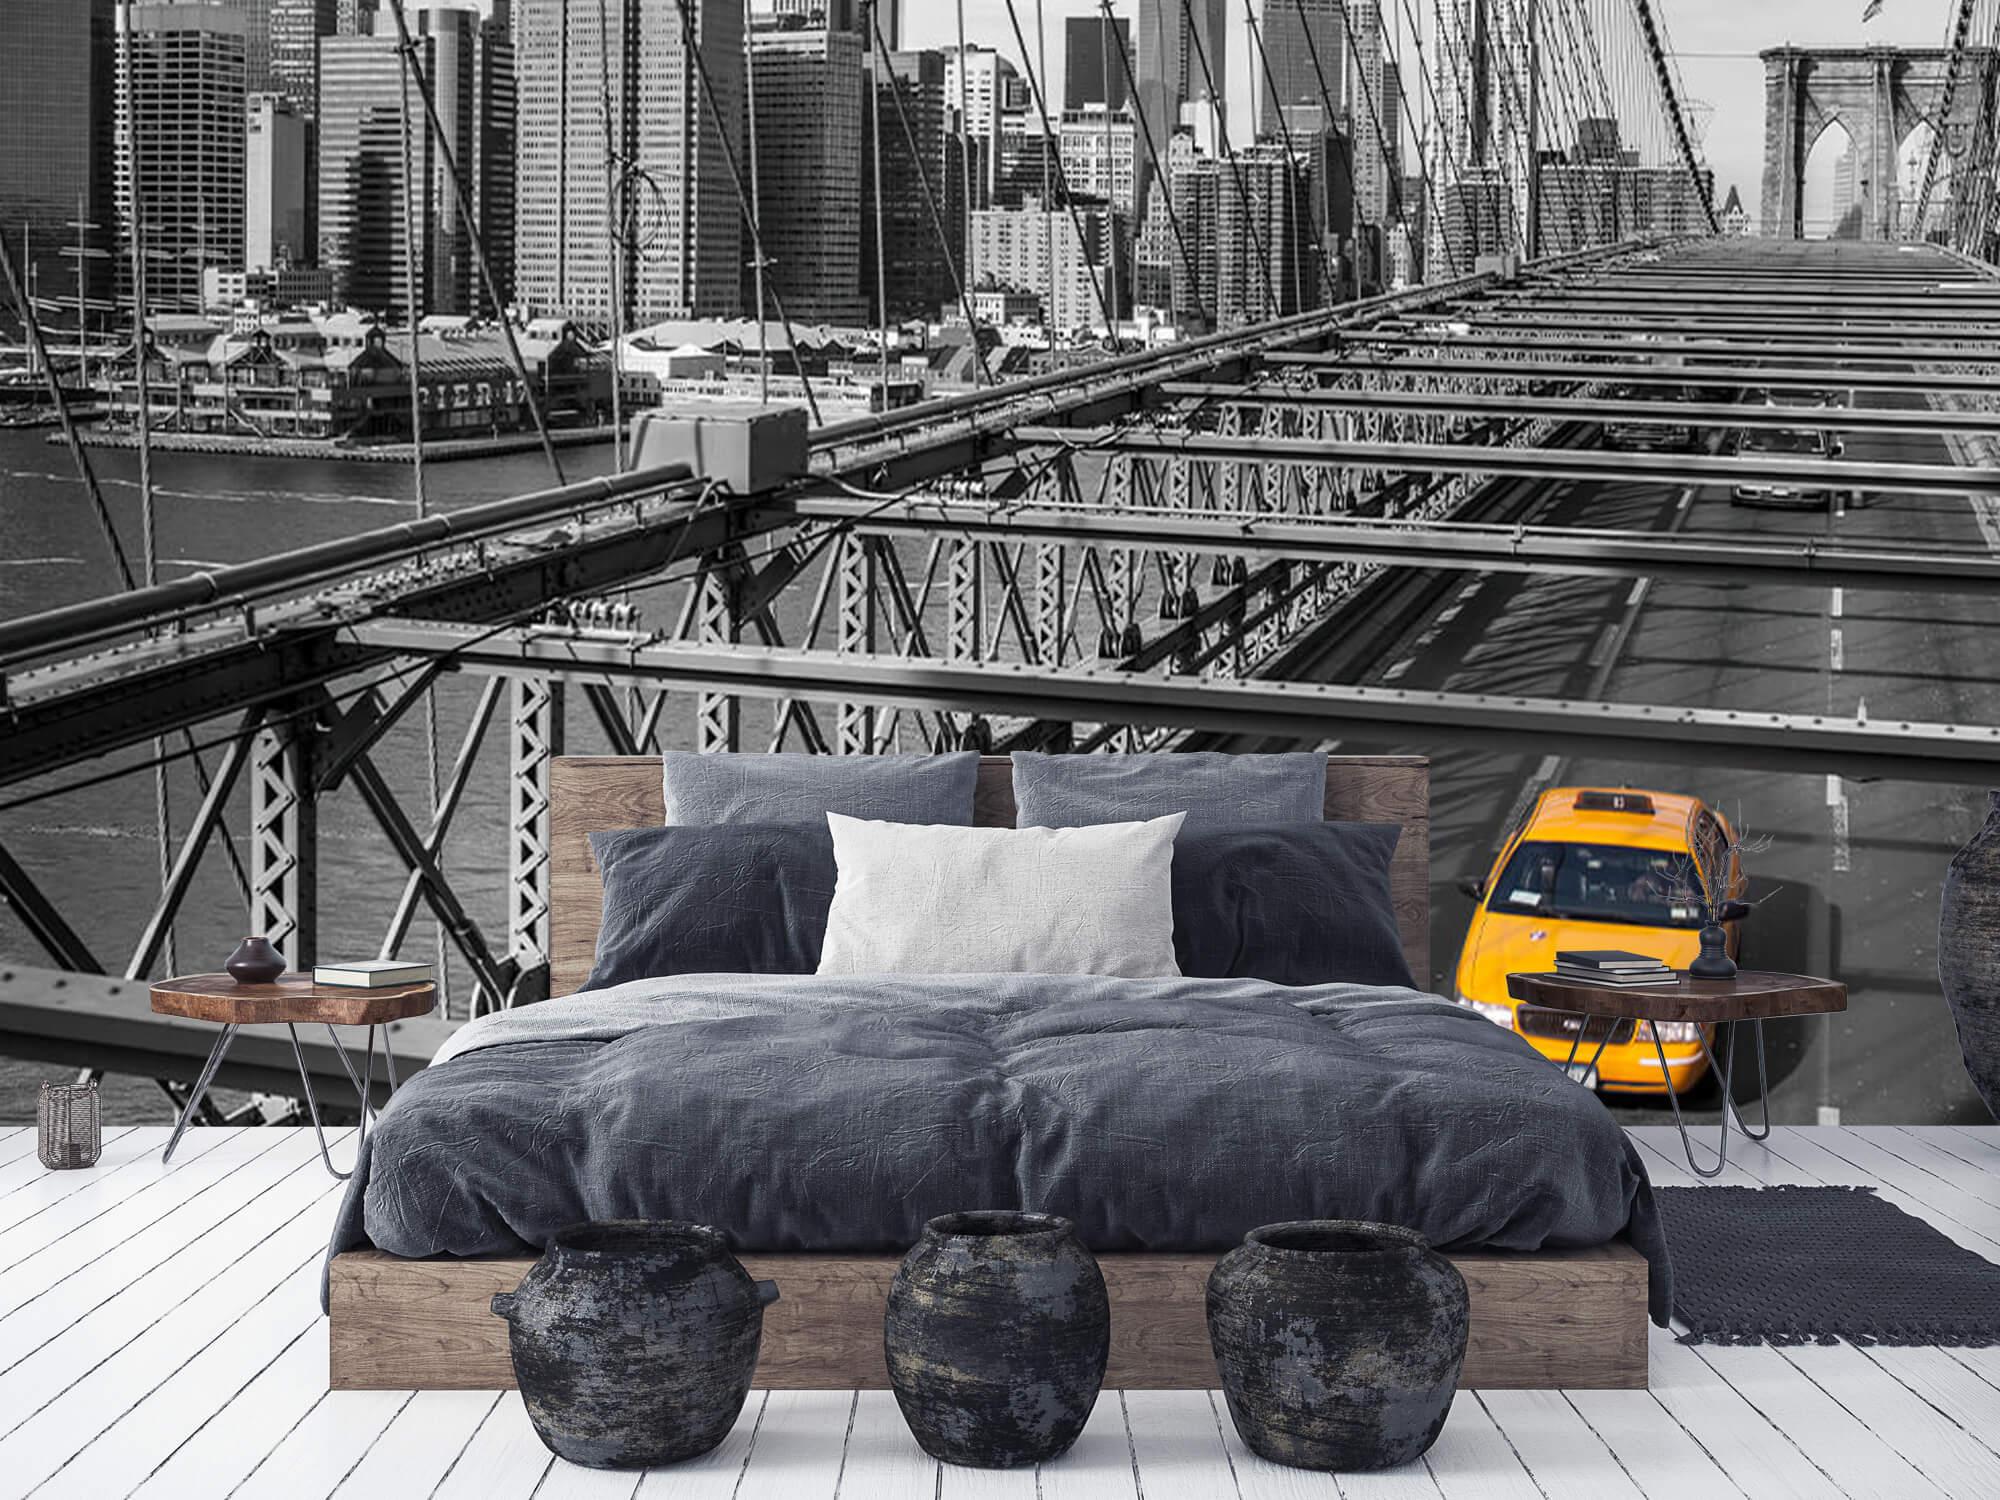 En taxi över Brooklyn Bridge 9